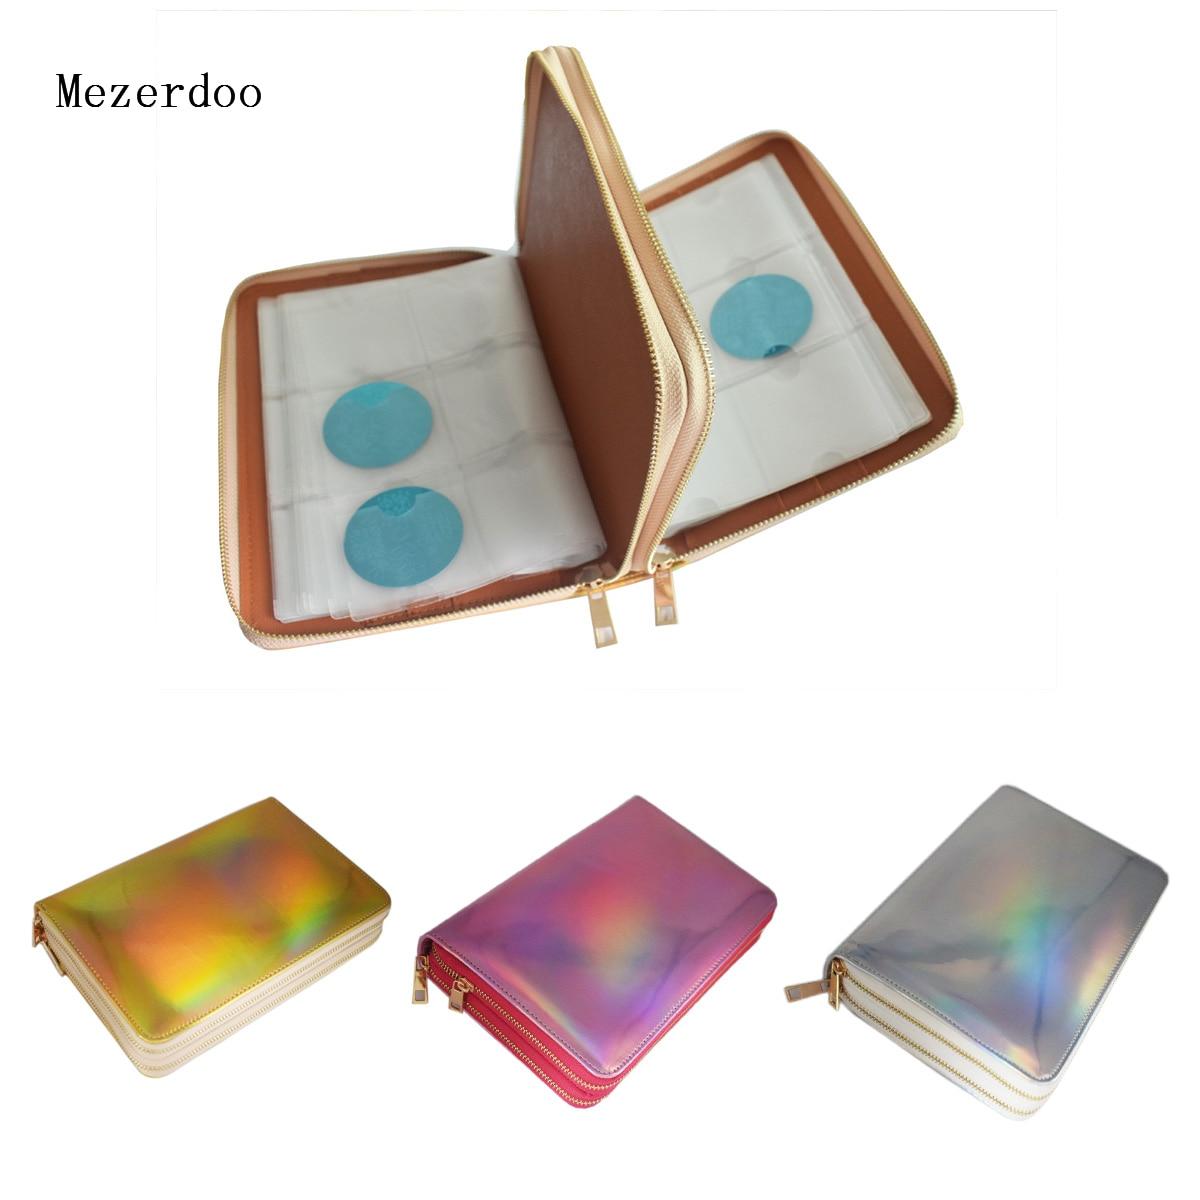 1 Pcs 336 Slots Stamping Plate Holder Case Rainbow Gold Silver Rose Round Square Nail Art Plate Organizer серьги art silver art silver ar004dwzmh30